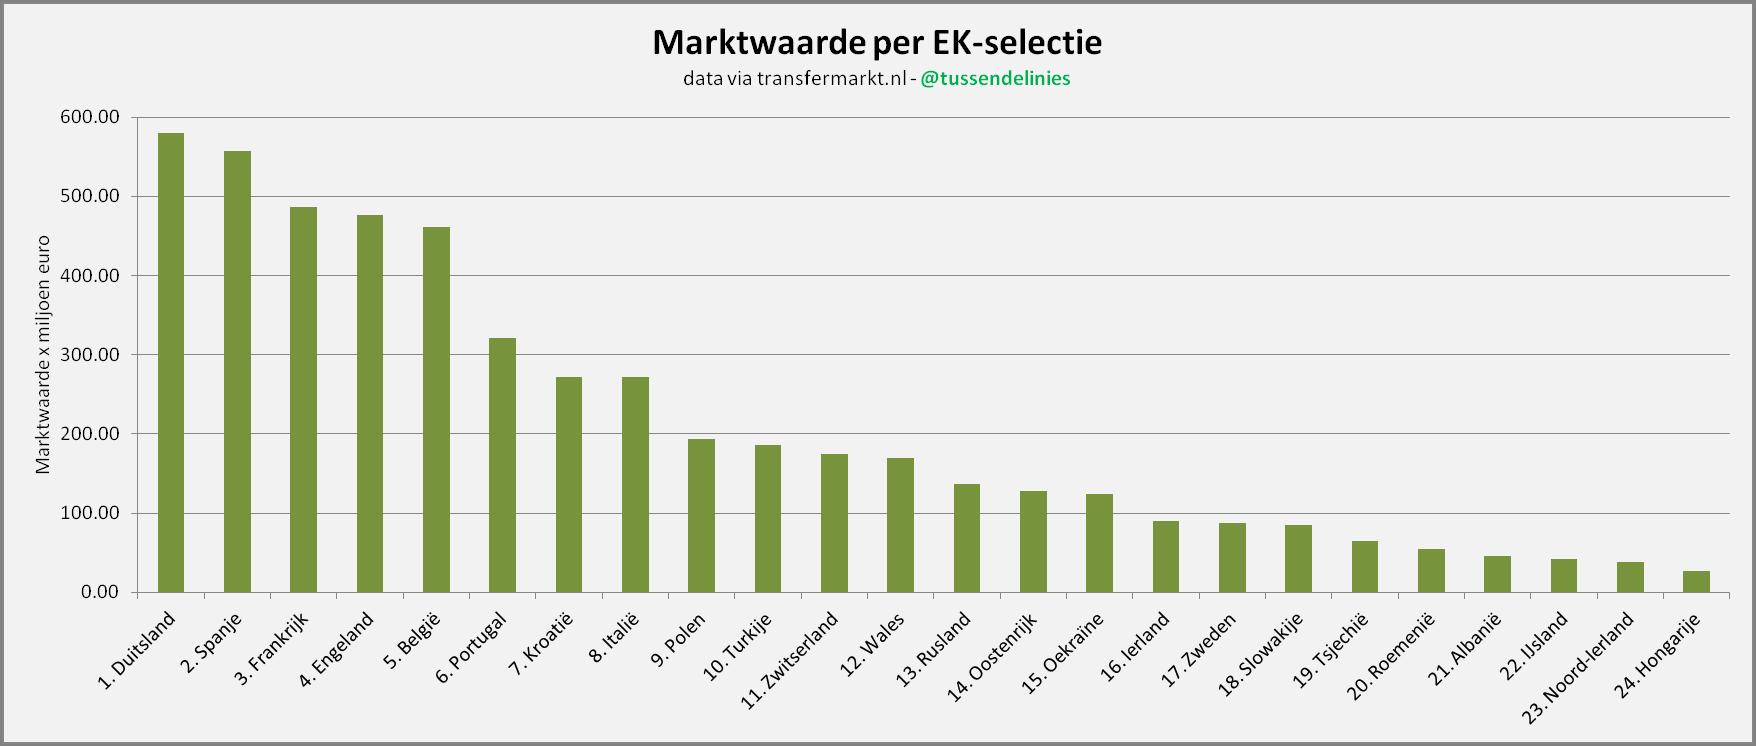 Afbeelding 1: Marktwaarde per EK-selectie